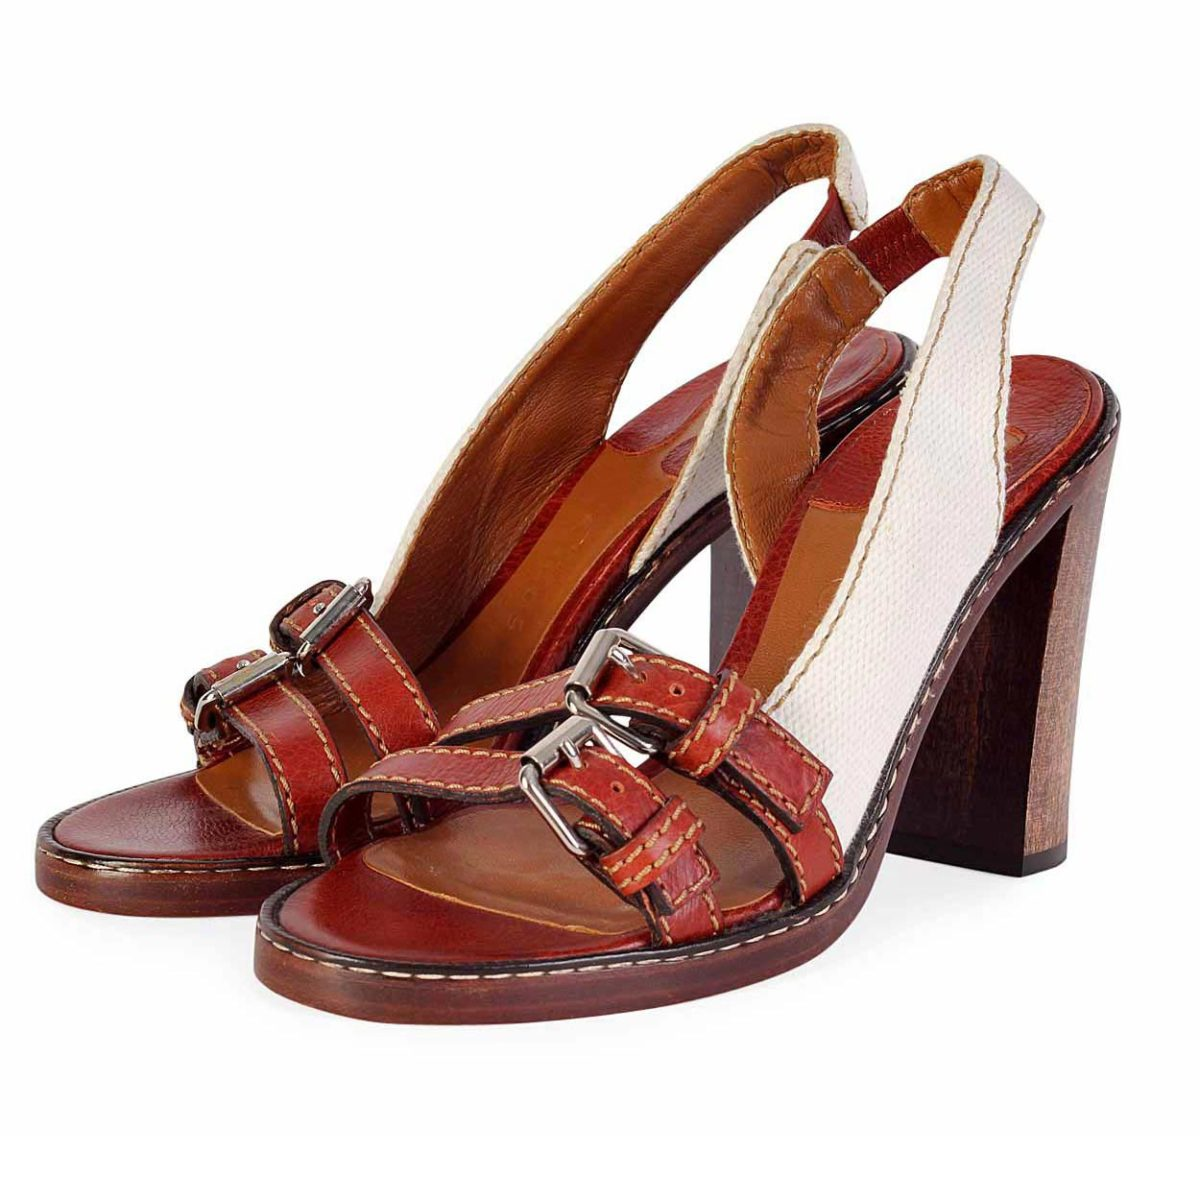 S385Luxity Wood Heel Chloe Sandals Slingback 0PNOkw8nXZ